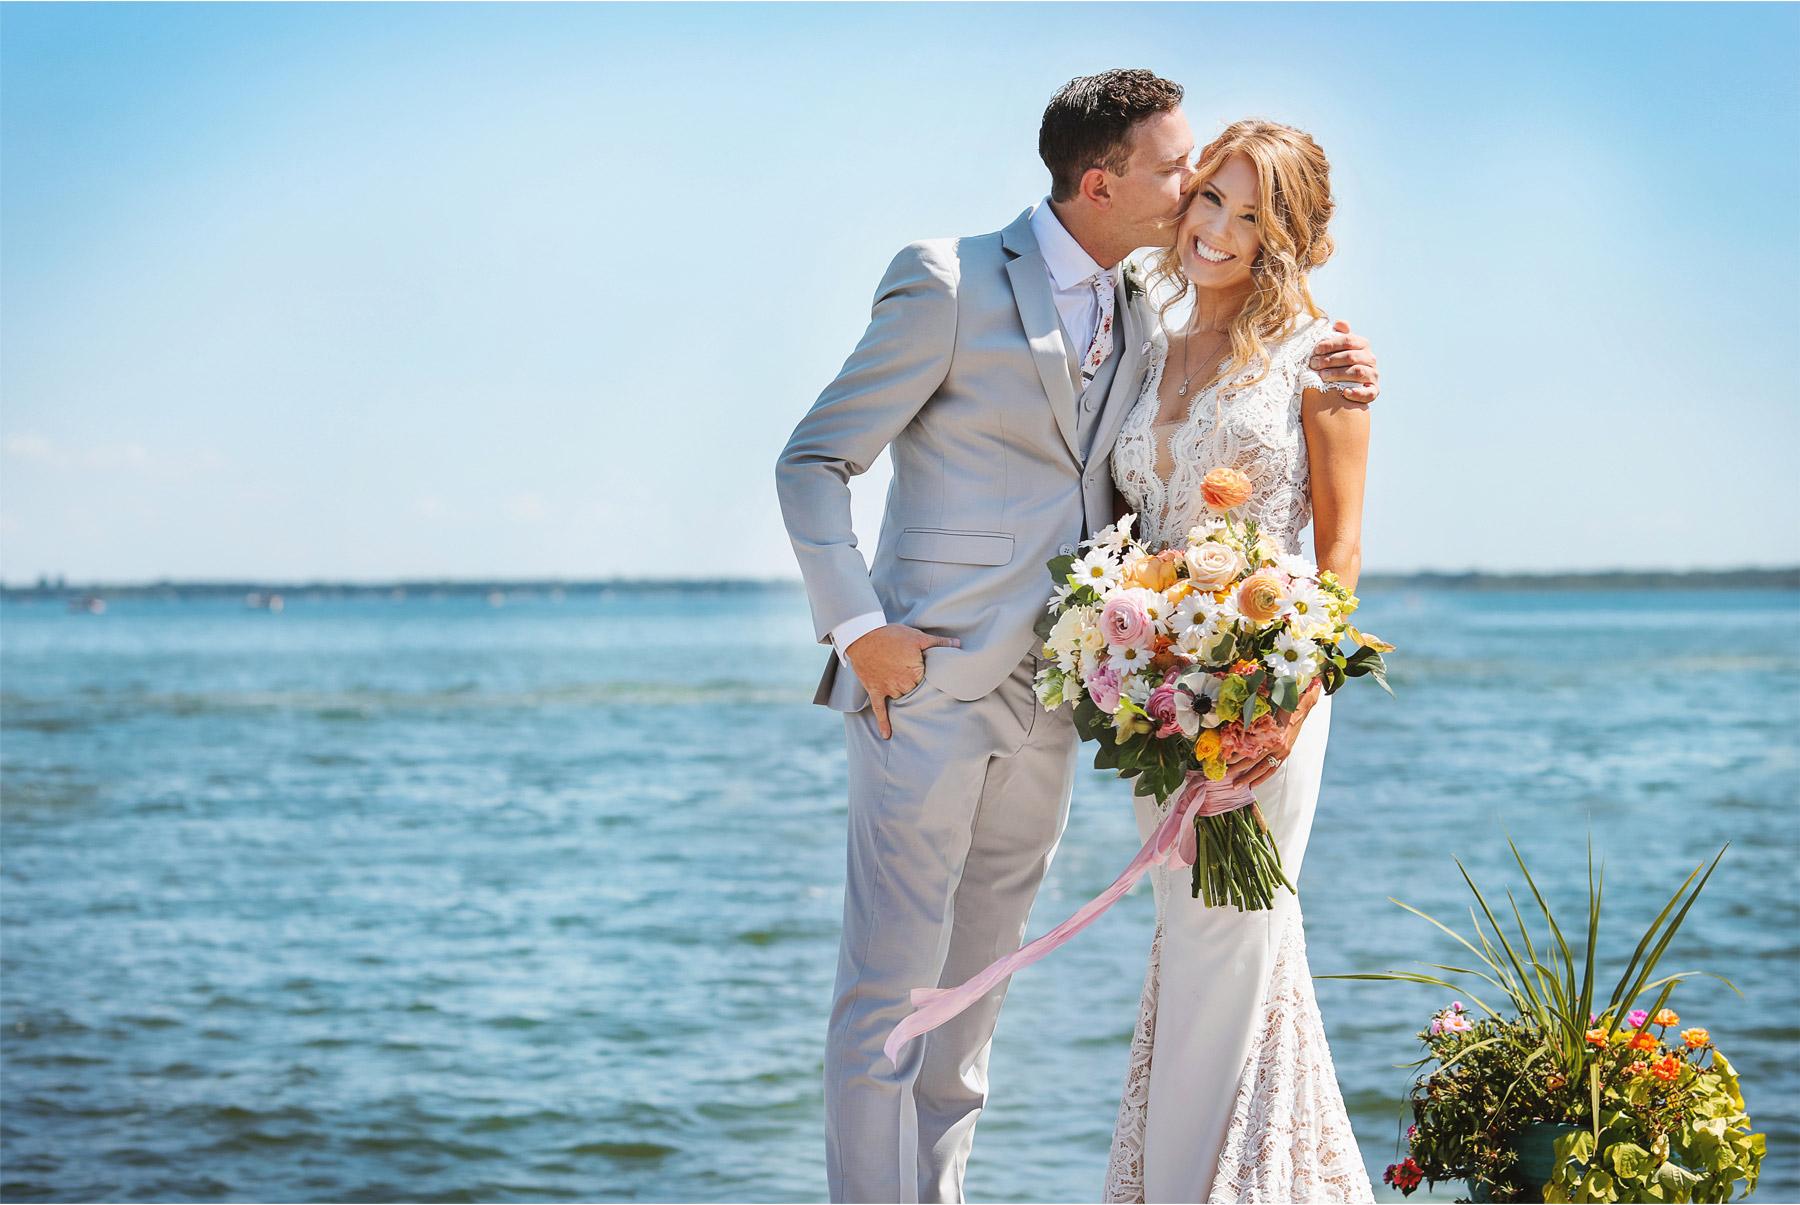 08-Vick-Photography-Wedding-Ottertail-Minnesota-Alice-in-Wonderland-Theme-First-Look-Bride-Groom-Lake-Dock-Tess-and-Greg.jpg